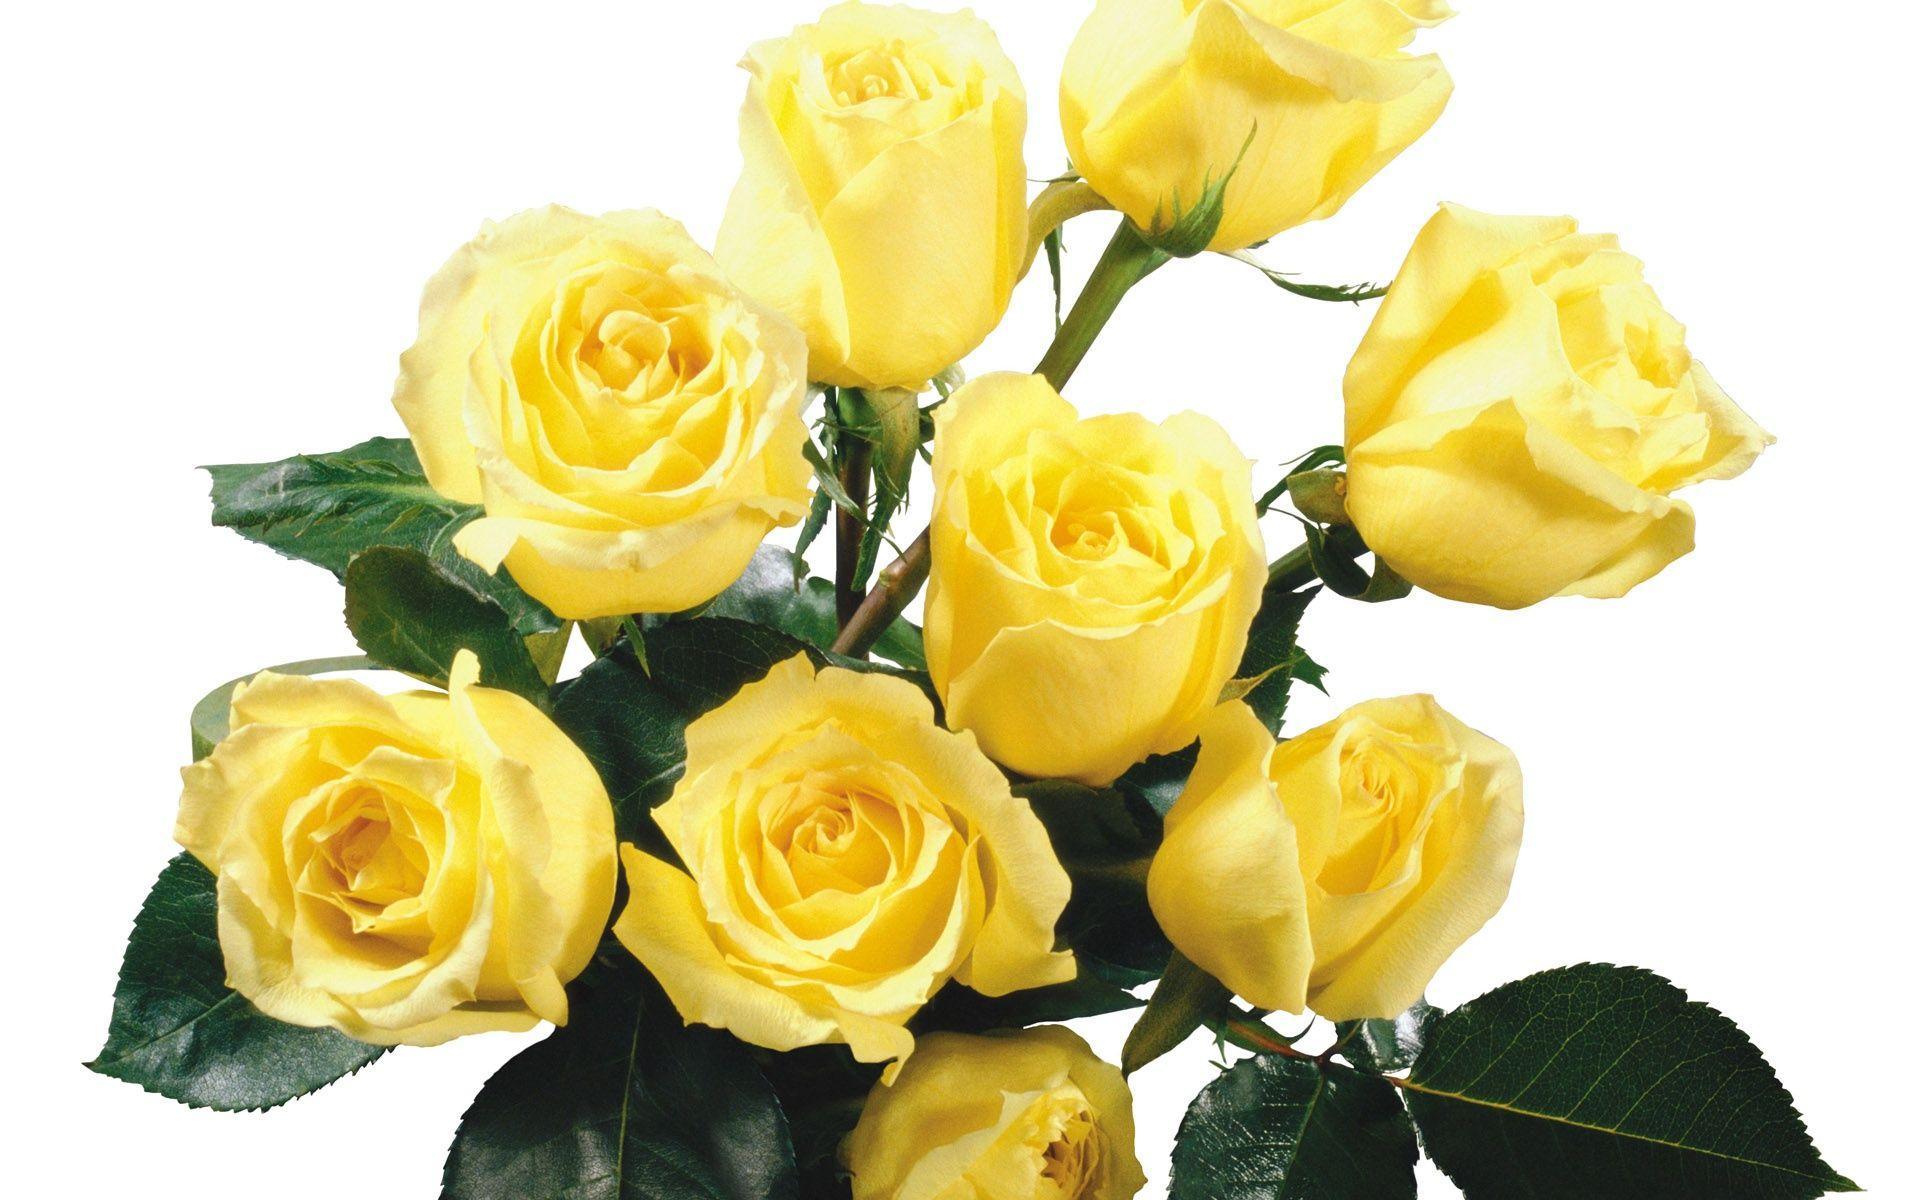 Hd wallpaper yellow flowers - Yellow Rose Wallpapers Full Hd Wallpaper Search